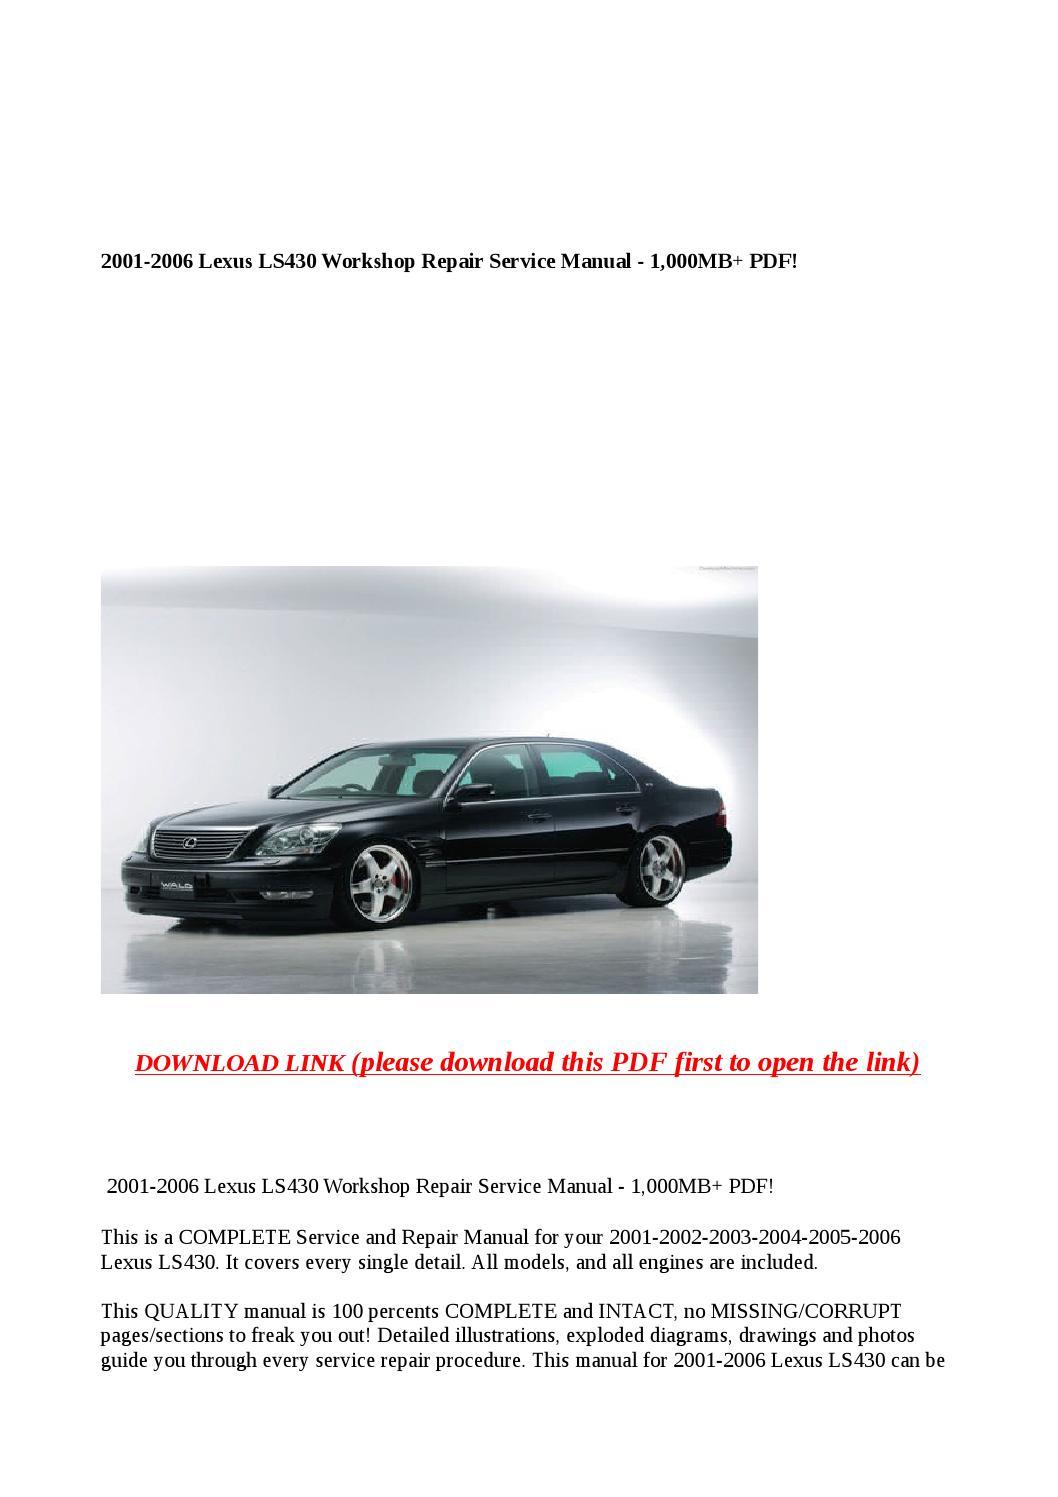 2006 cbr600rr service manual pdf